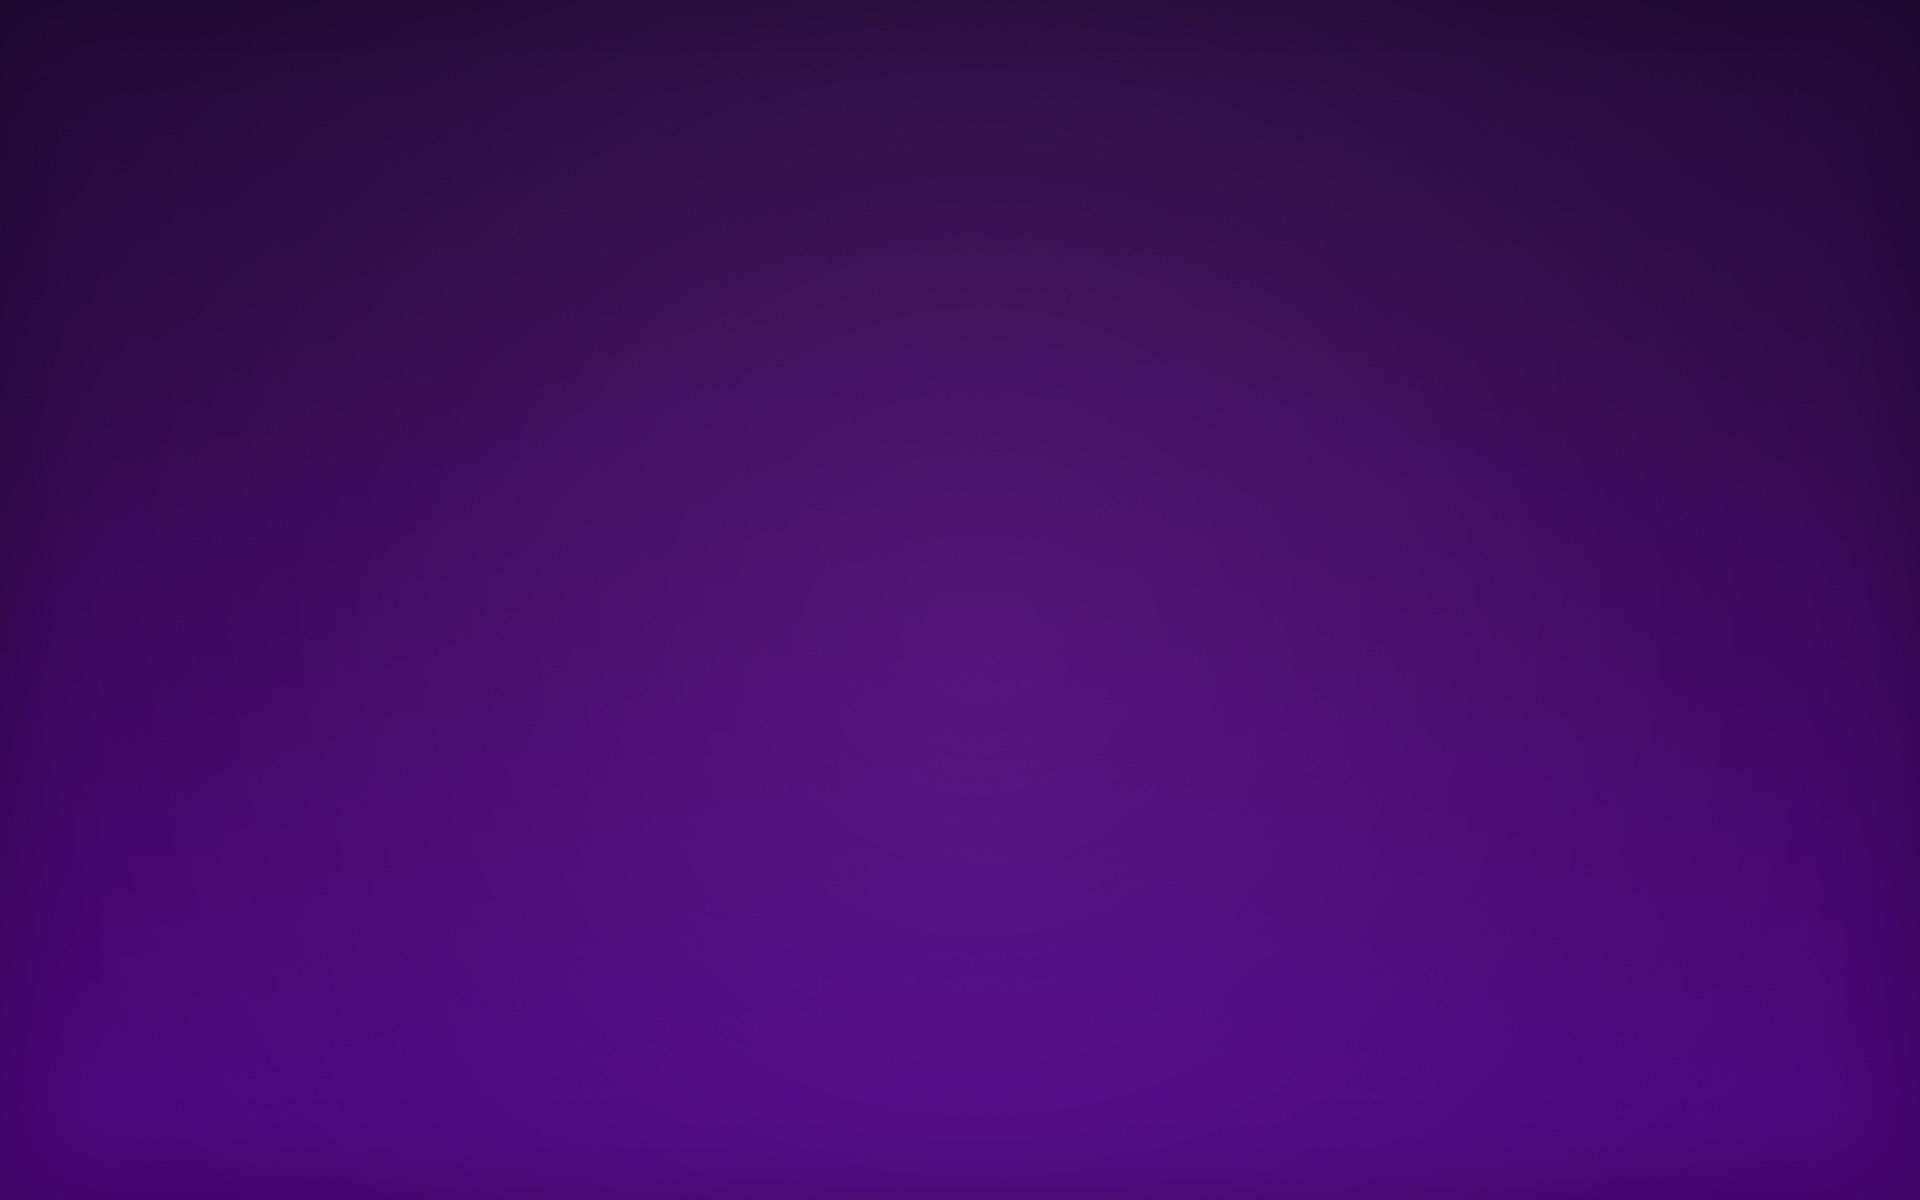 Purple Wallpaper Widescreen HD 7093 Wallpaper Cool Walldiskpaper 1920x1200